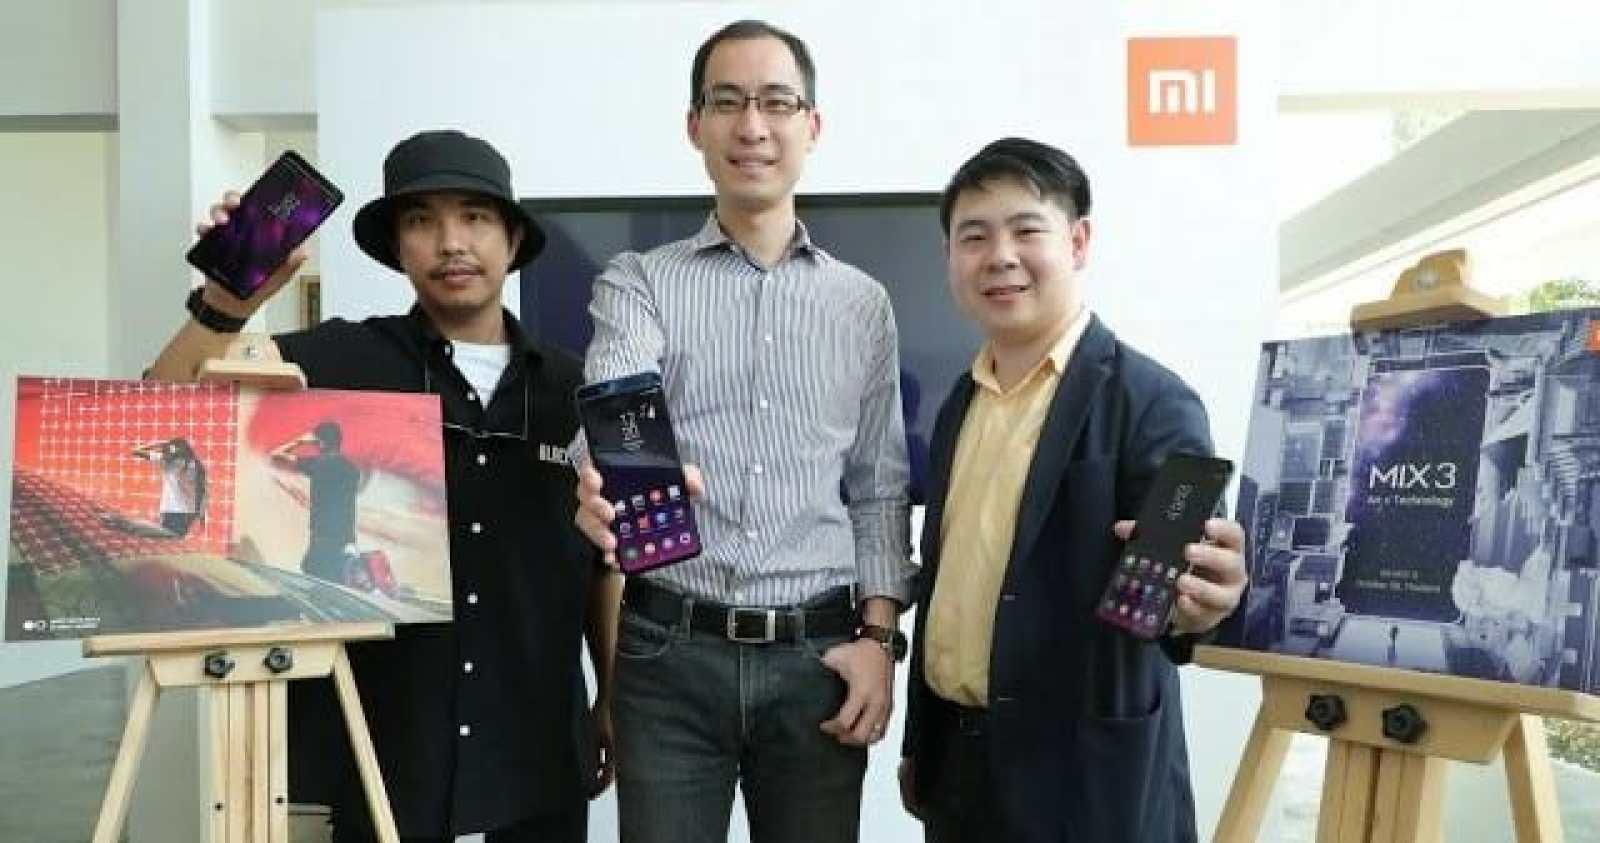 - Xiaomi14 4 - Xiaomi มียอดจัดส่งสมาร์ทโฟนได้กว่า 100 ล้านเครื่อง ขึ้นแท่นเป็นผู้จำหน่ายโทรศัพท์มือถือที่เติบโตเร็วที่สุดในประเทศไทย